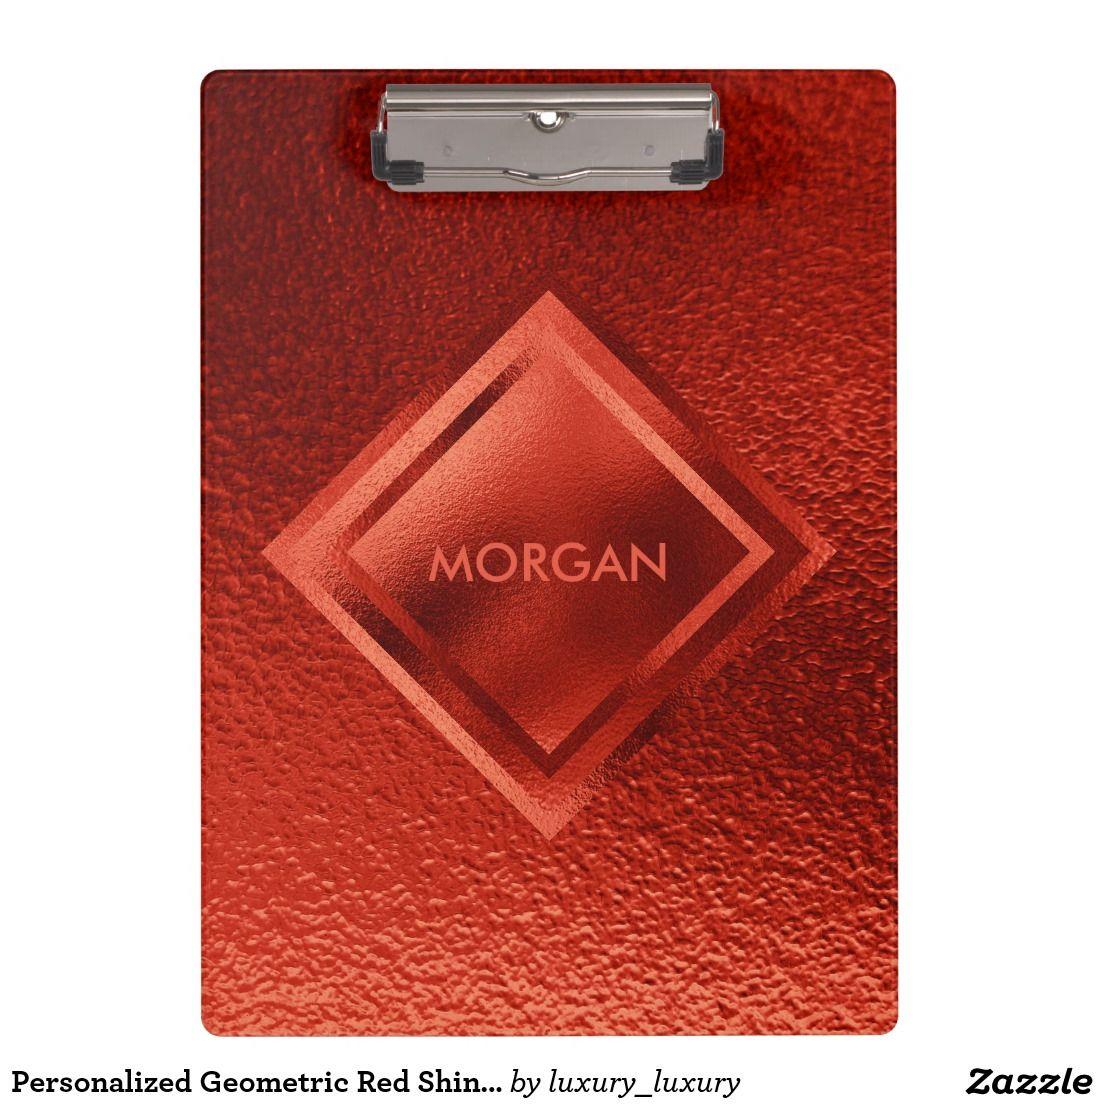 Personalized Geometric Red Shiny Metalic Clipboard